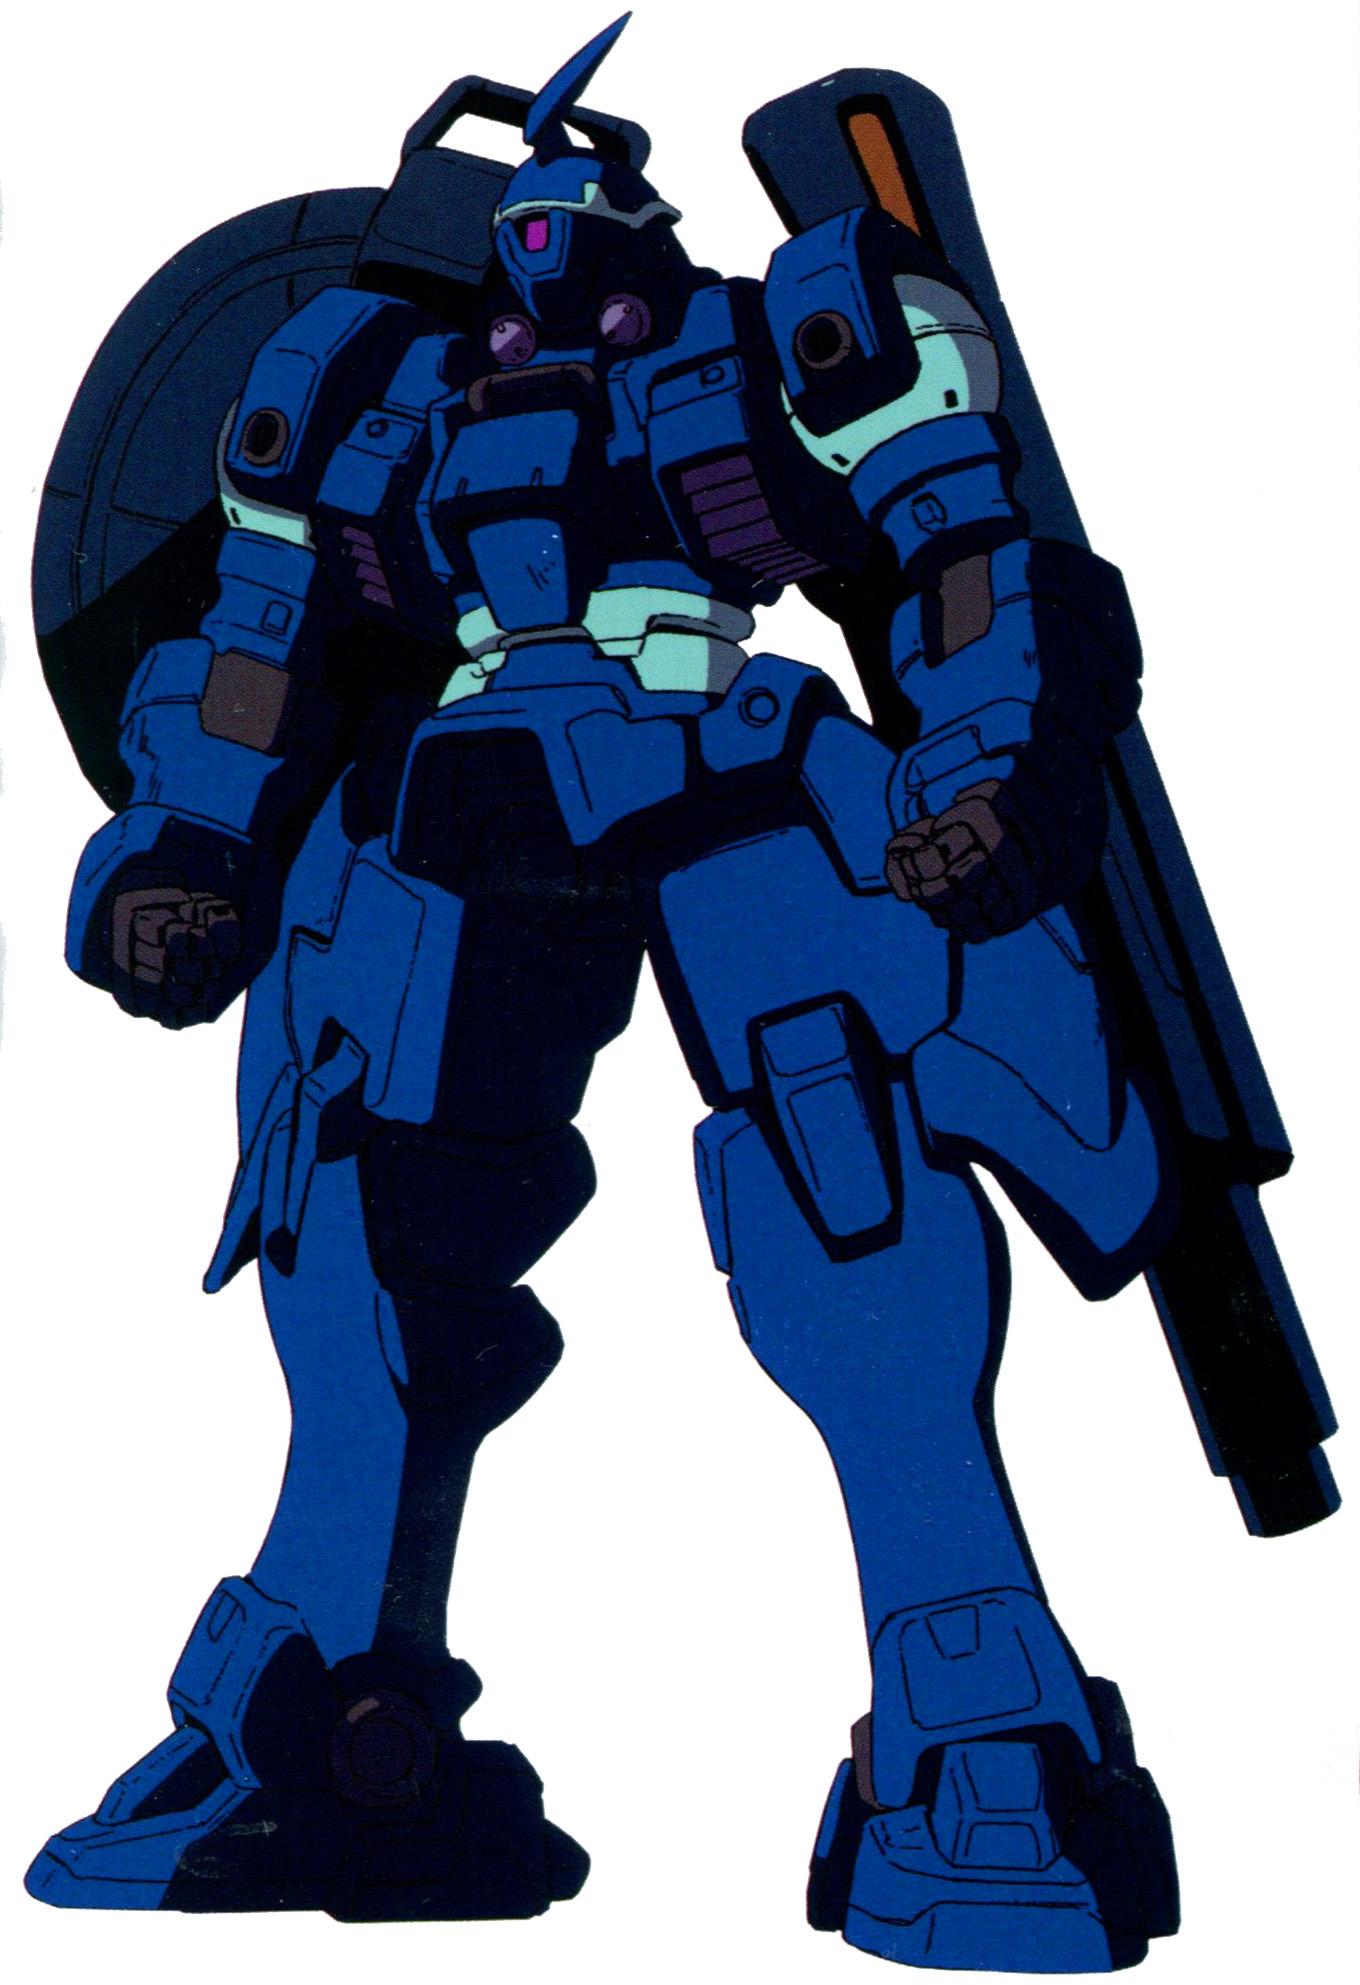 OZ-13MSX1 Vayeate | The Gundam Wiki | Fandom powered by Wikia Gundam Wing Deathscythe Hell Wallpaper